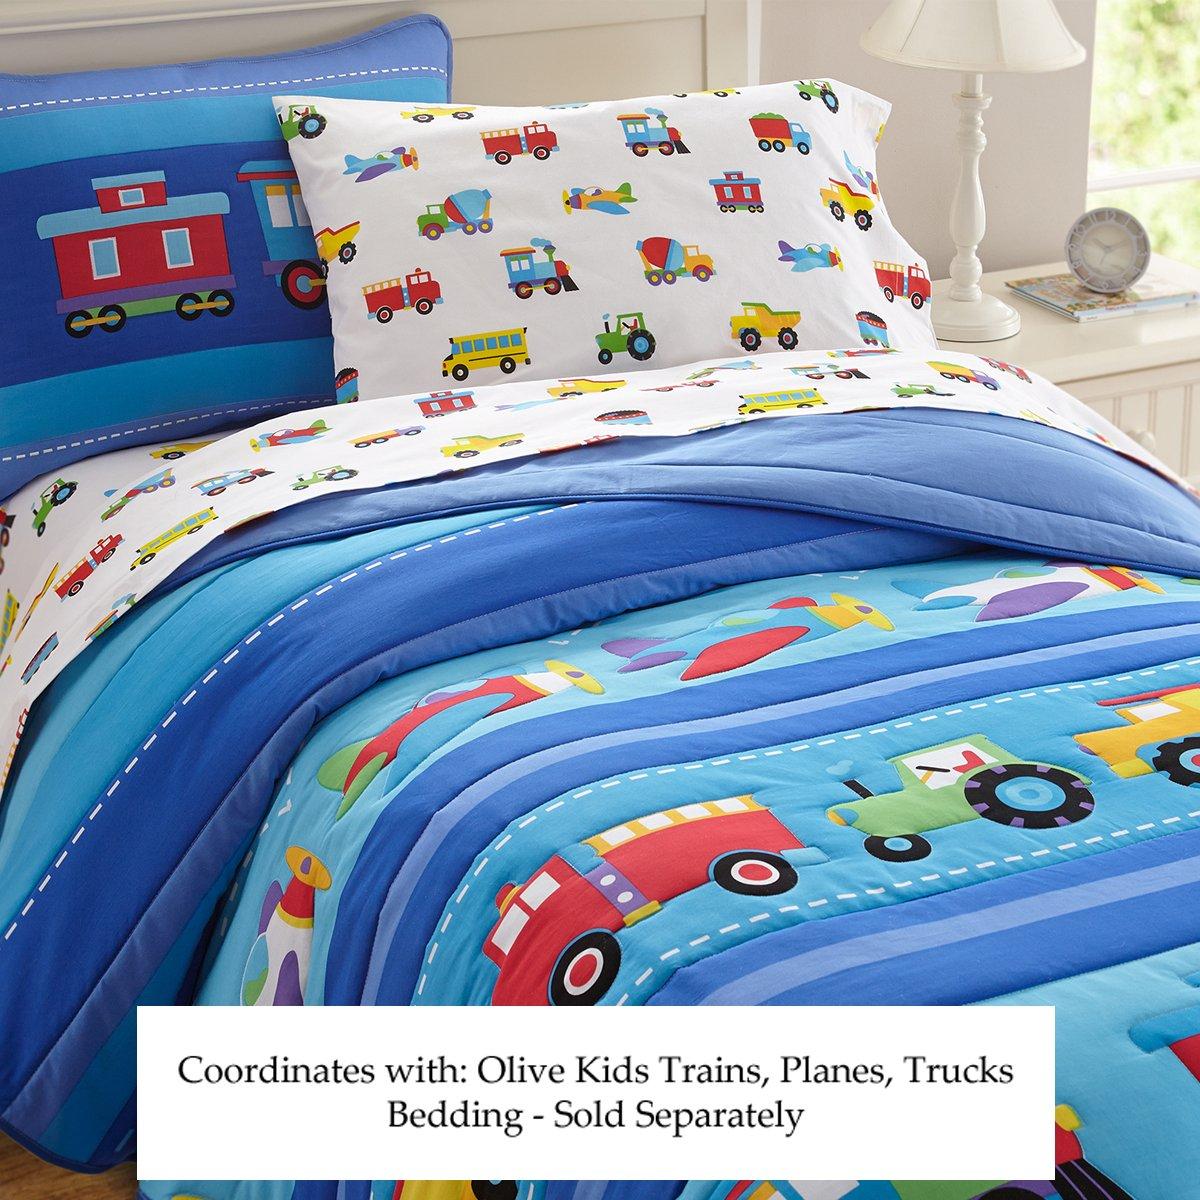 Amazon.com: Olive Kids Trains, Planes, Trucks Toy Box Bench: Toys & Games